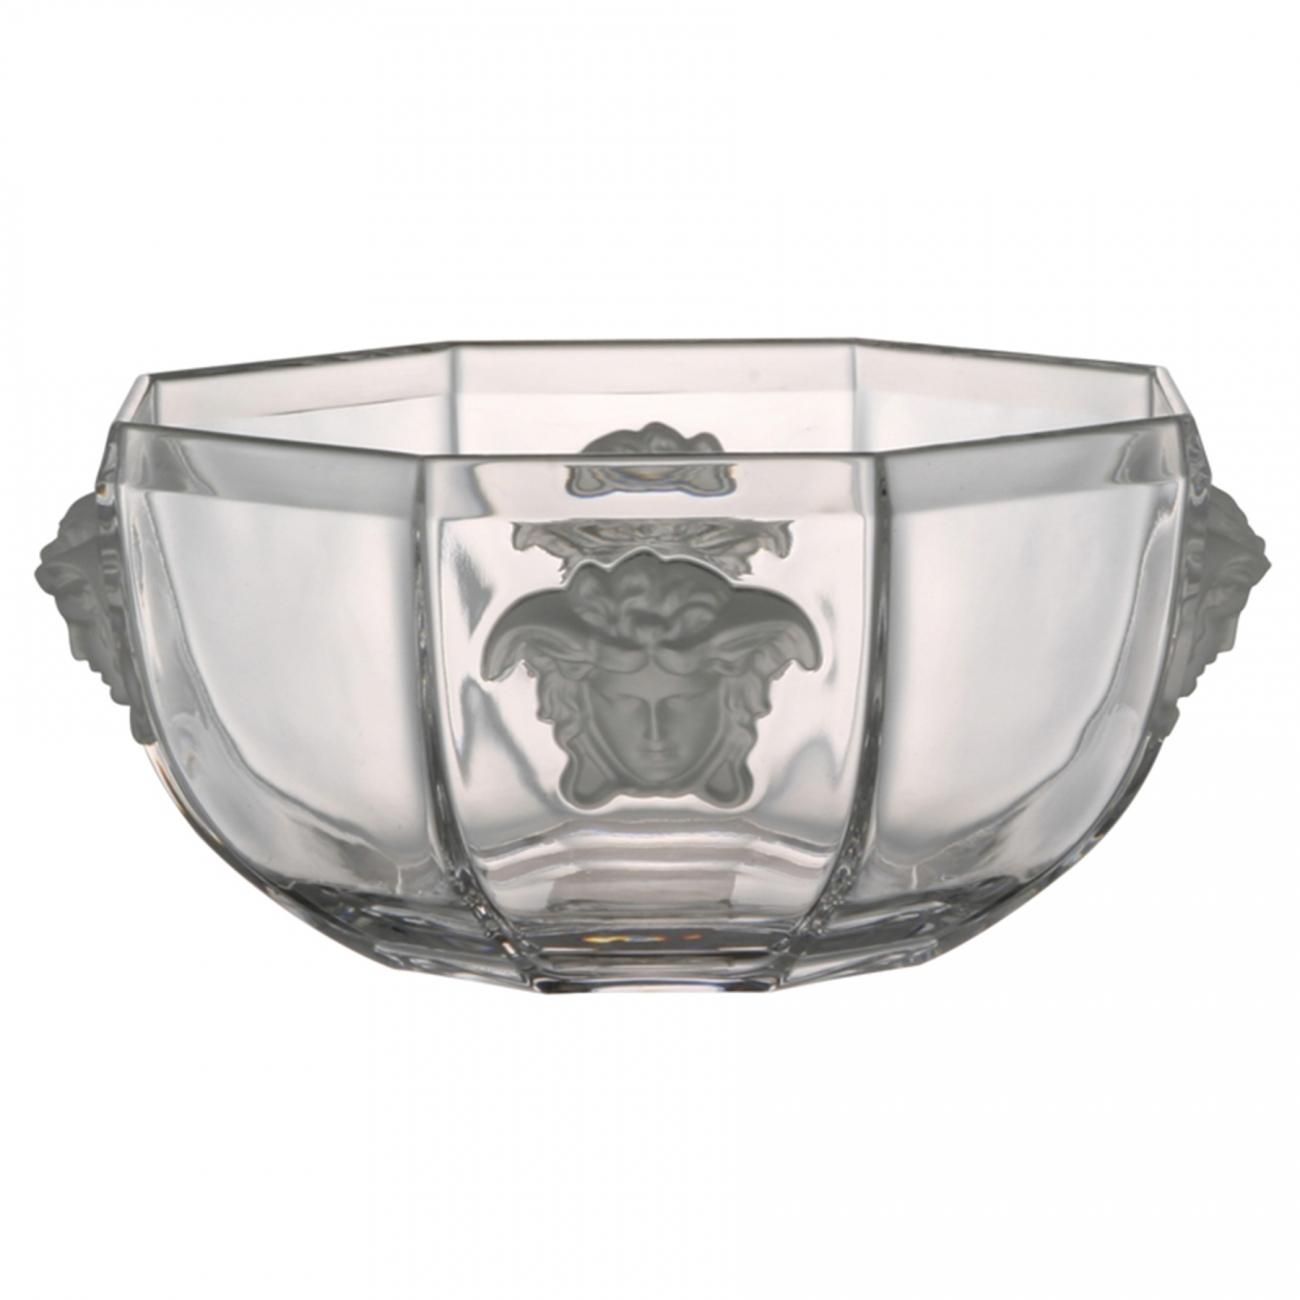 Rosenthal Versace Medusa Lumière Dish 18 cm